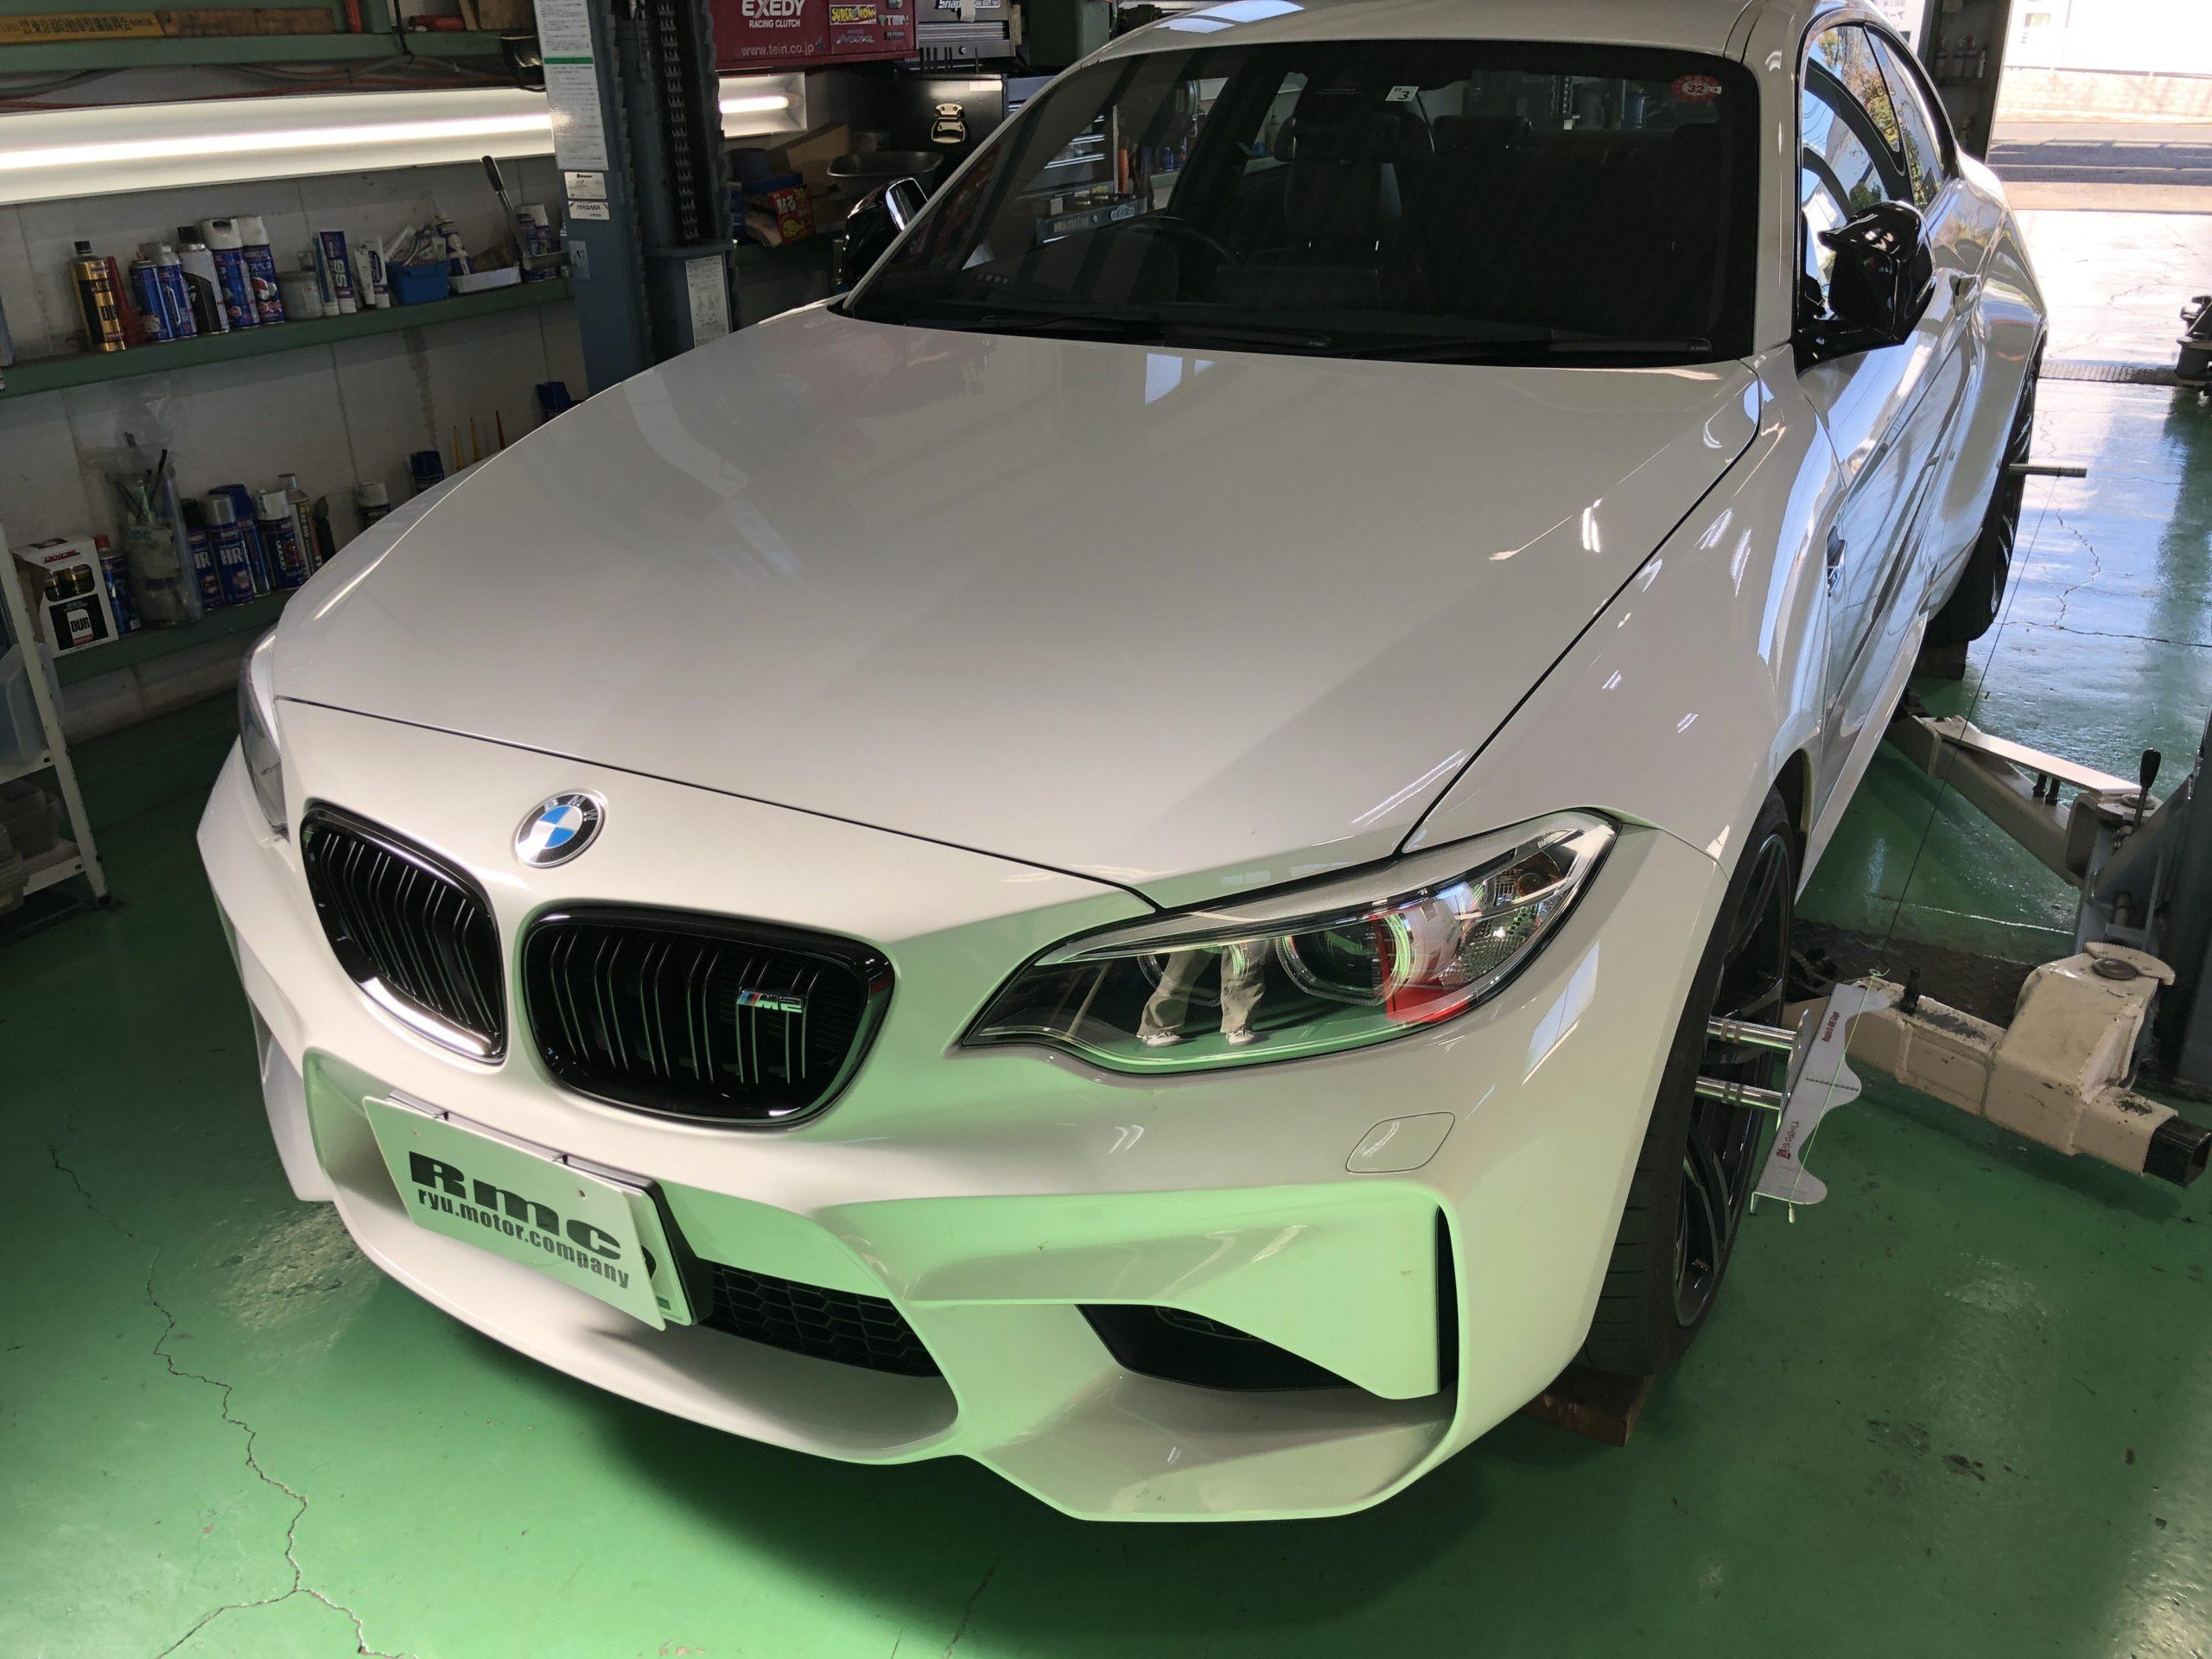 BMWF87M2クーペ BILSTEIN B16 車高調取付後アライメント測定&調整❗️武蔵村山市K様 BMWF87M2クーペ